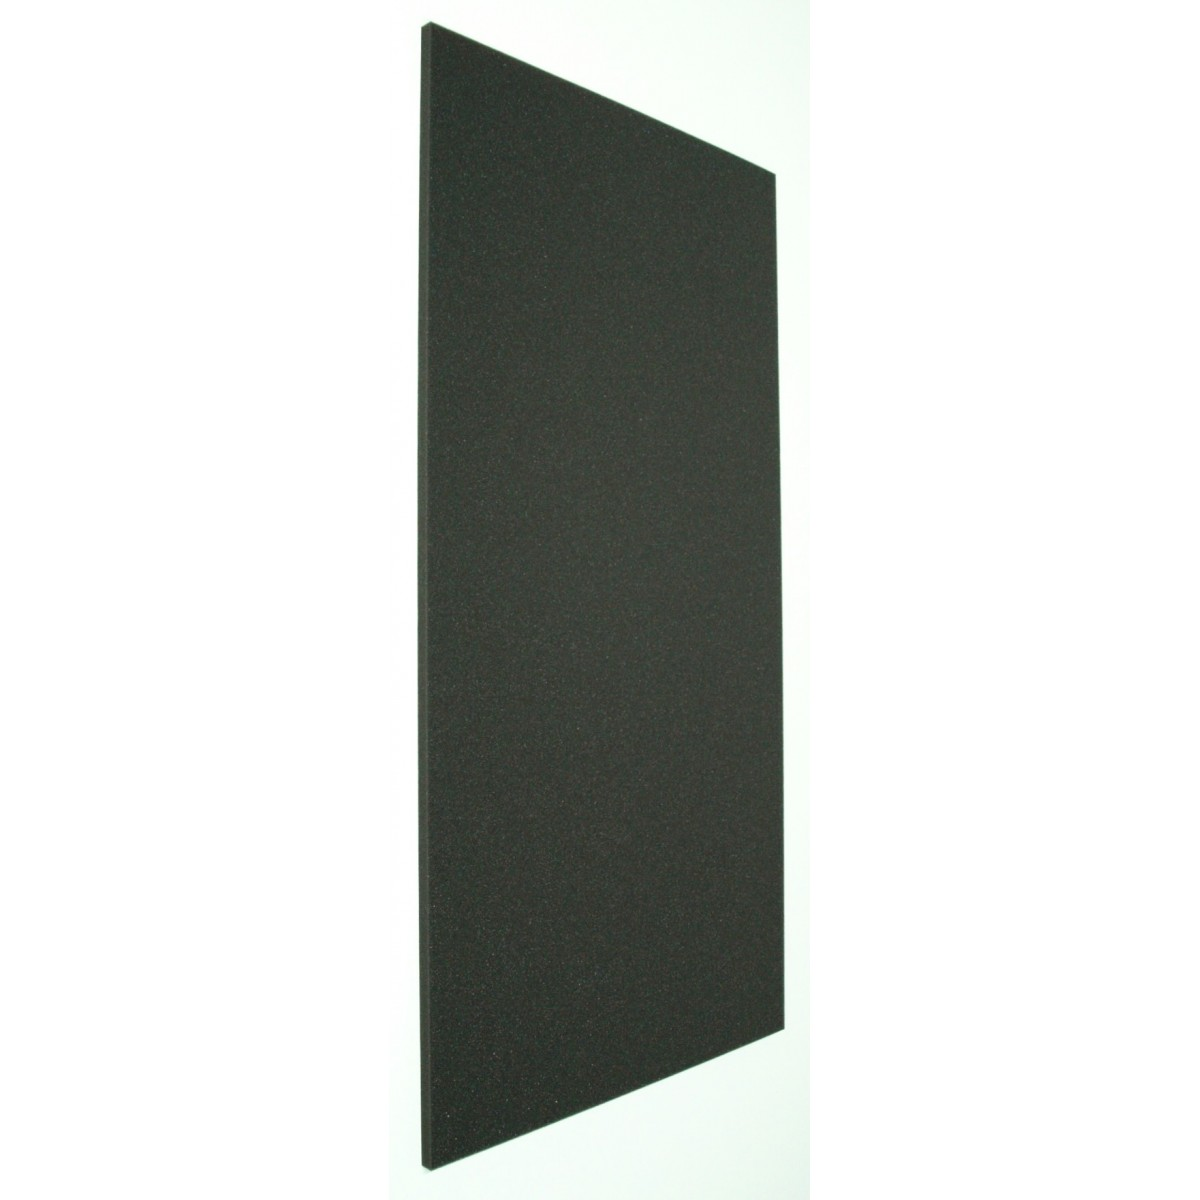 EliAcoustic Regular Panel 120.2 First. Panel Acustico espuma fonoabsorbente